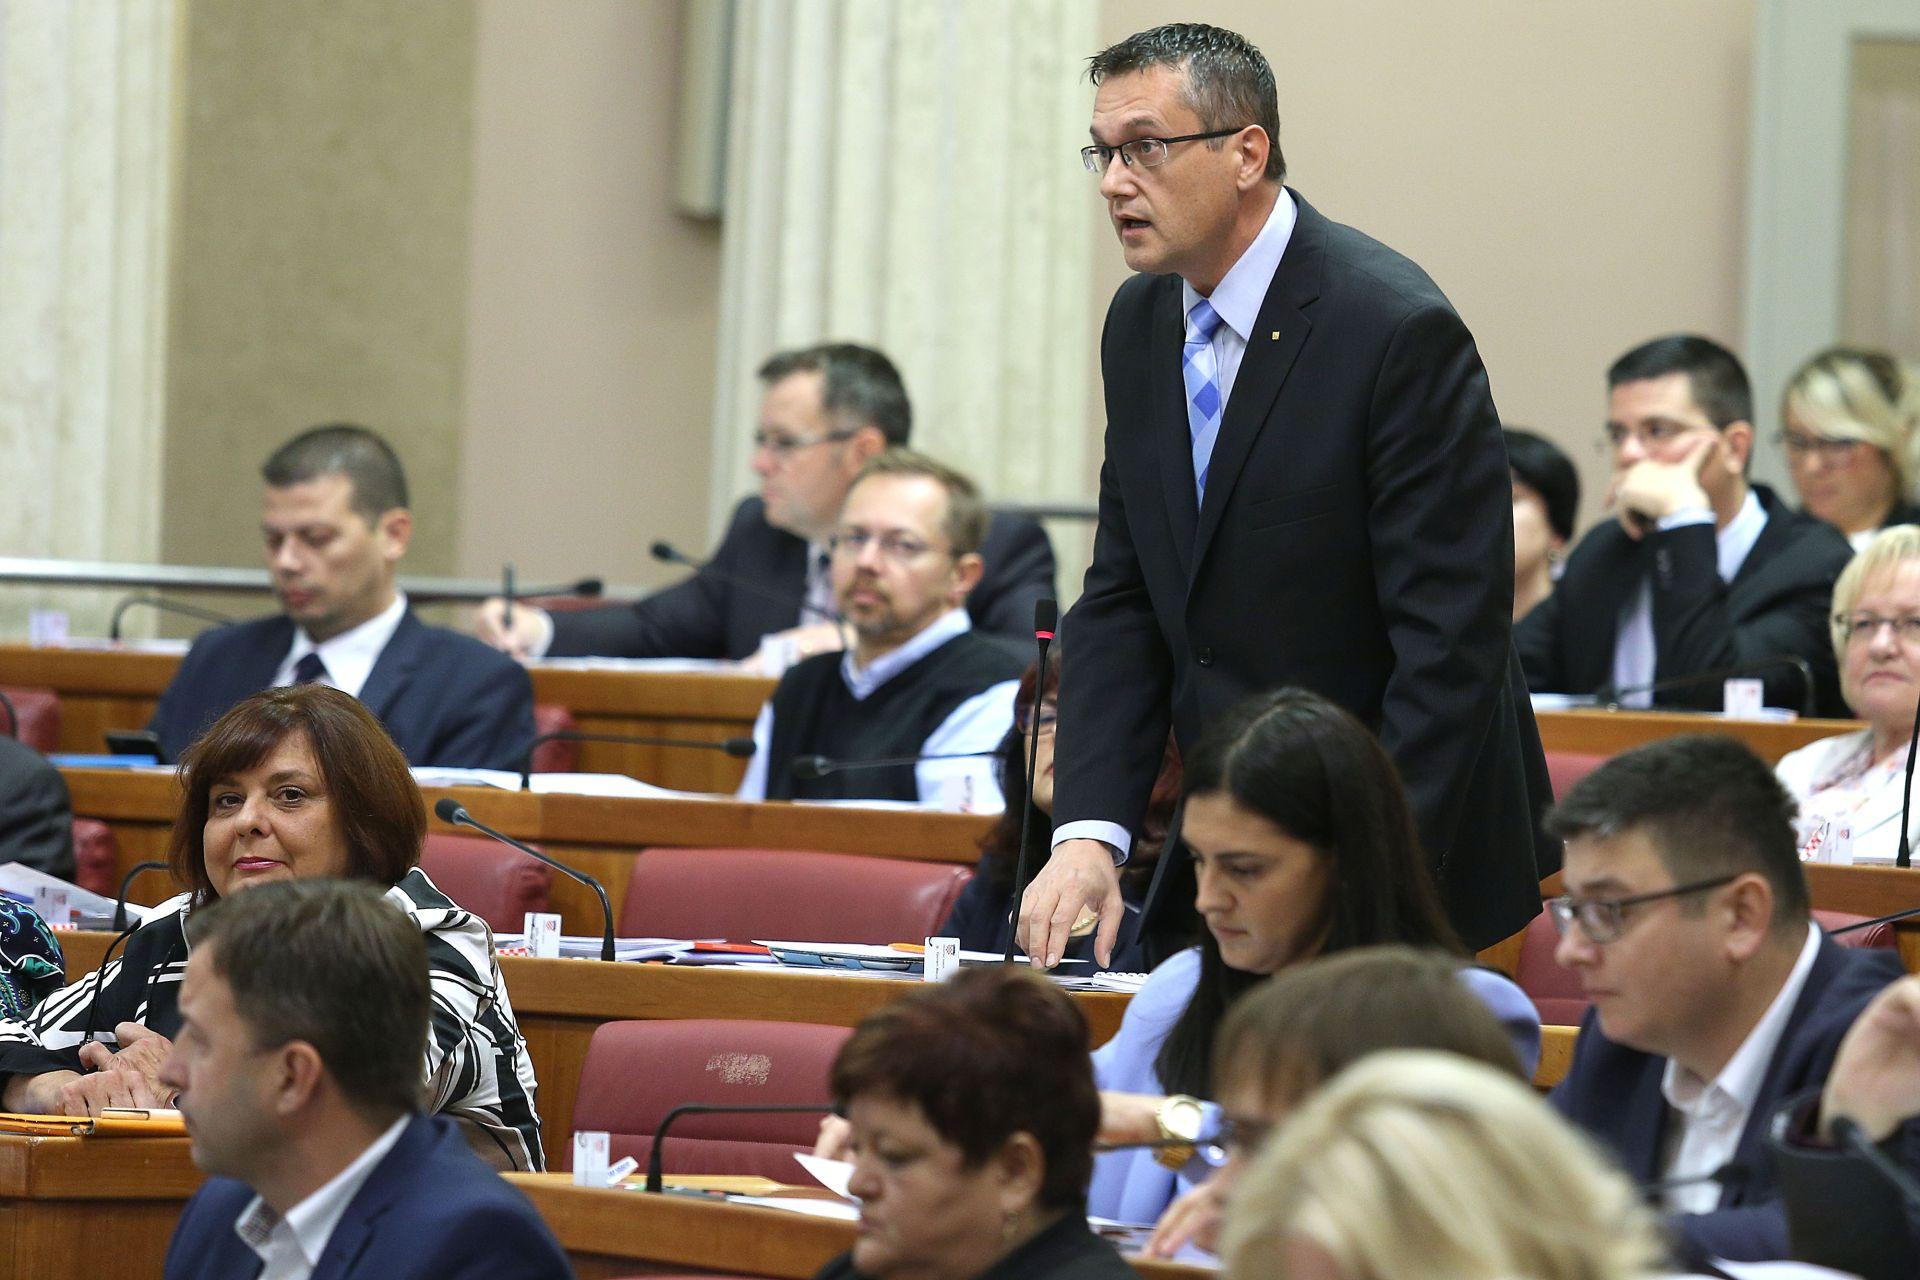 BEUS RICHEMBERGH: HNS pokreće opoziv ministra Barišića